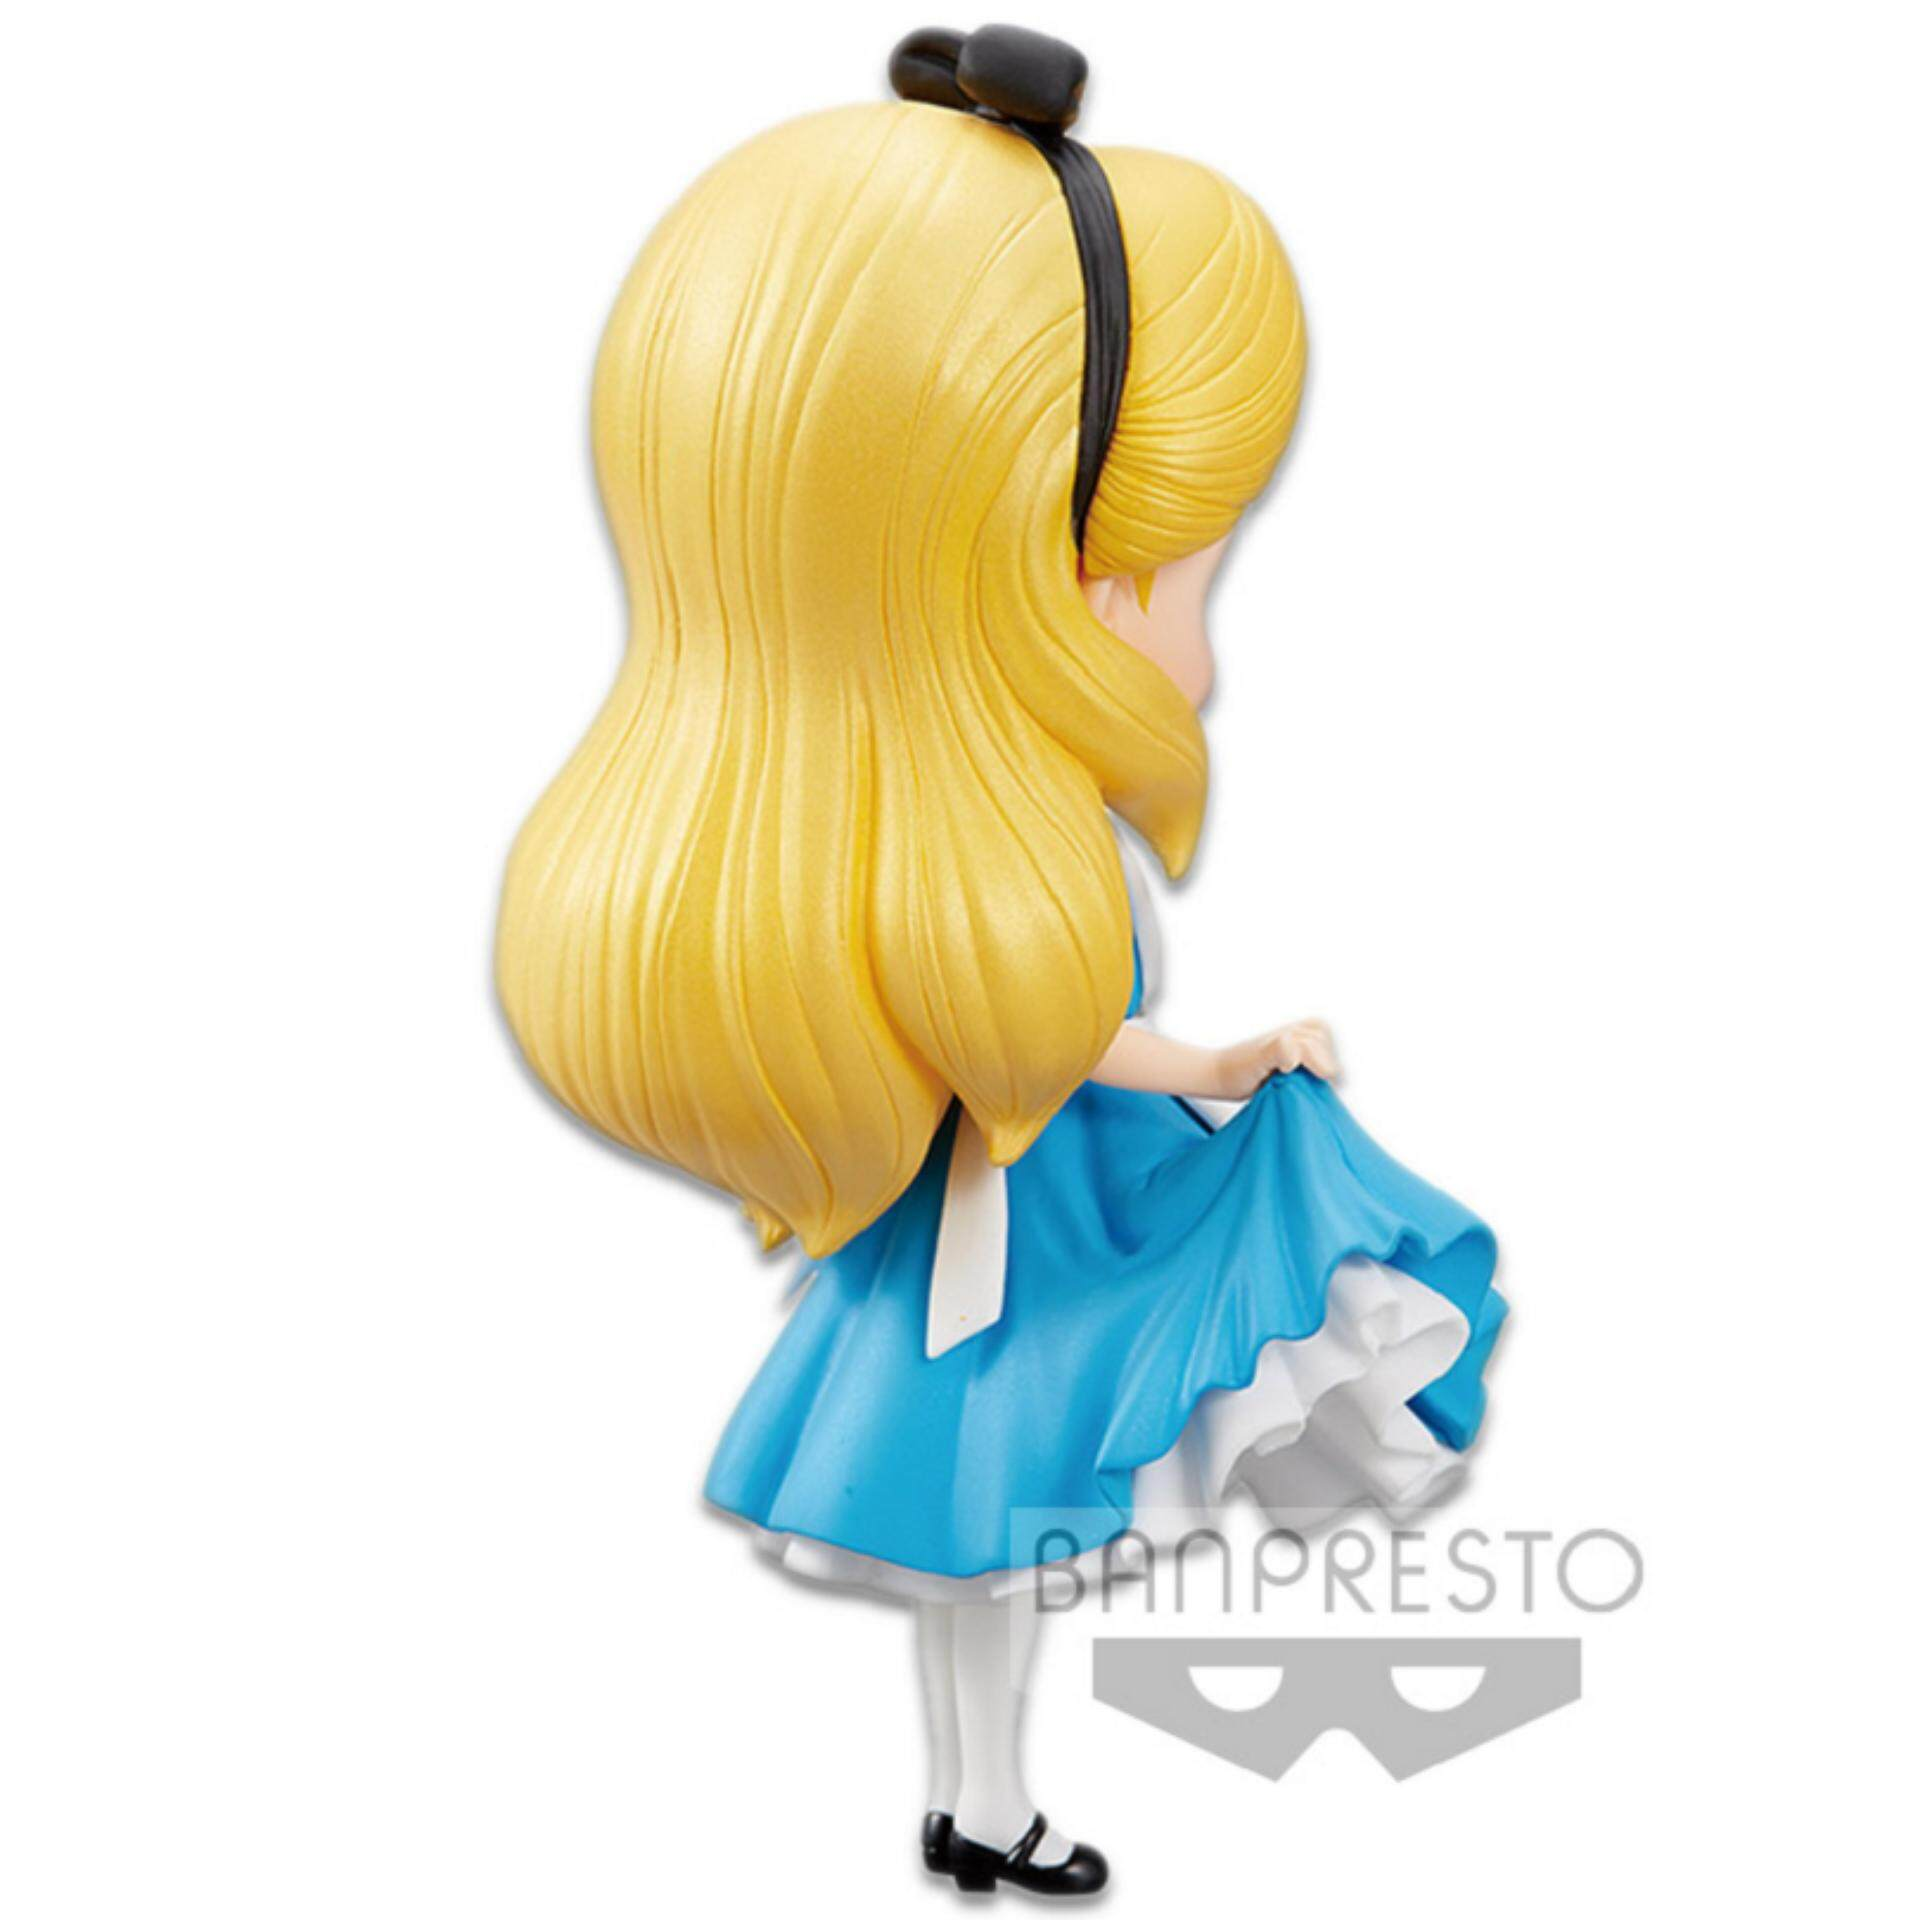 Banpresto Q Posket Disney Princess Figure Normal Version - Alice Toys for boys